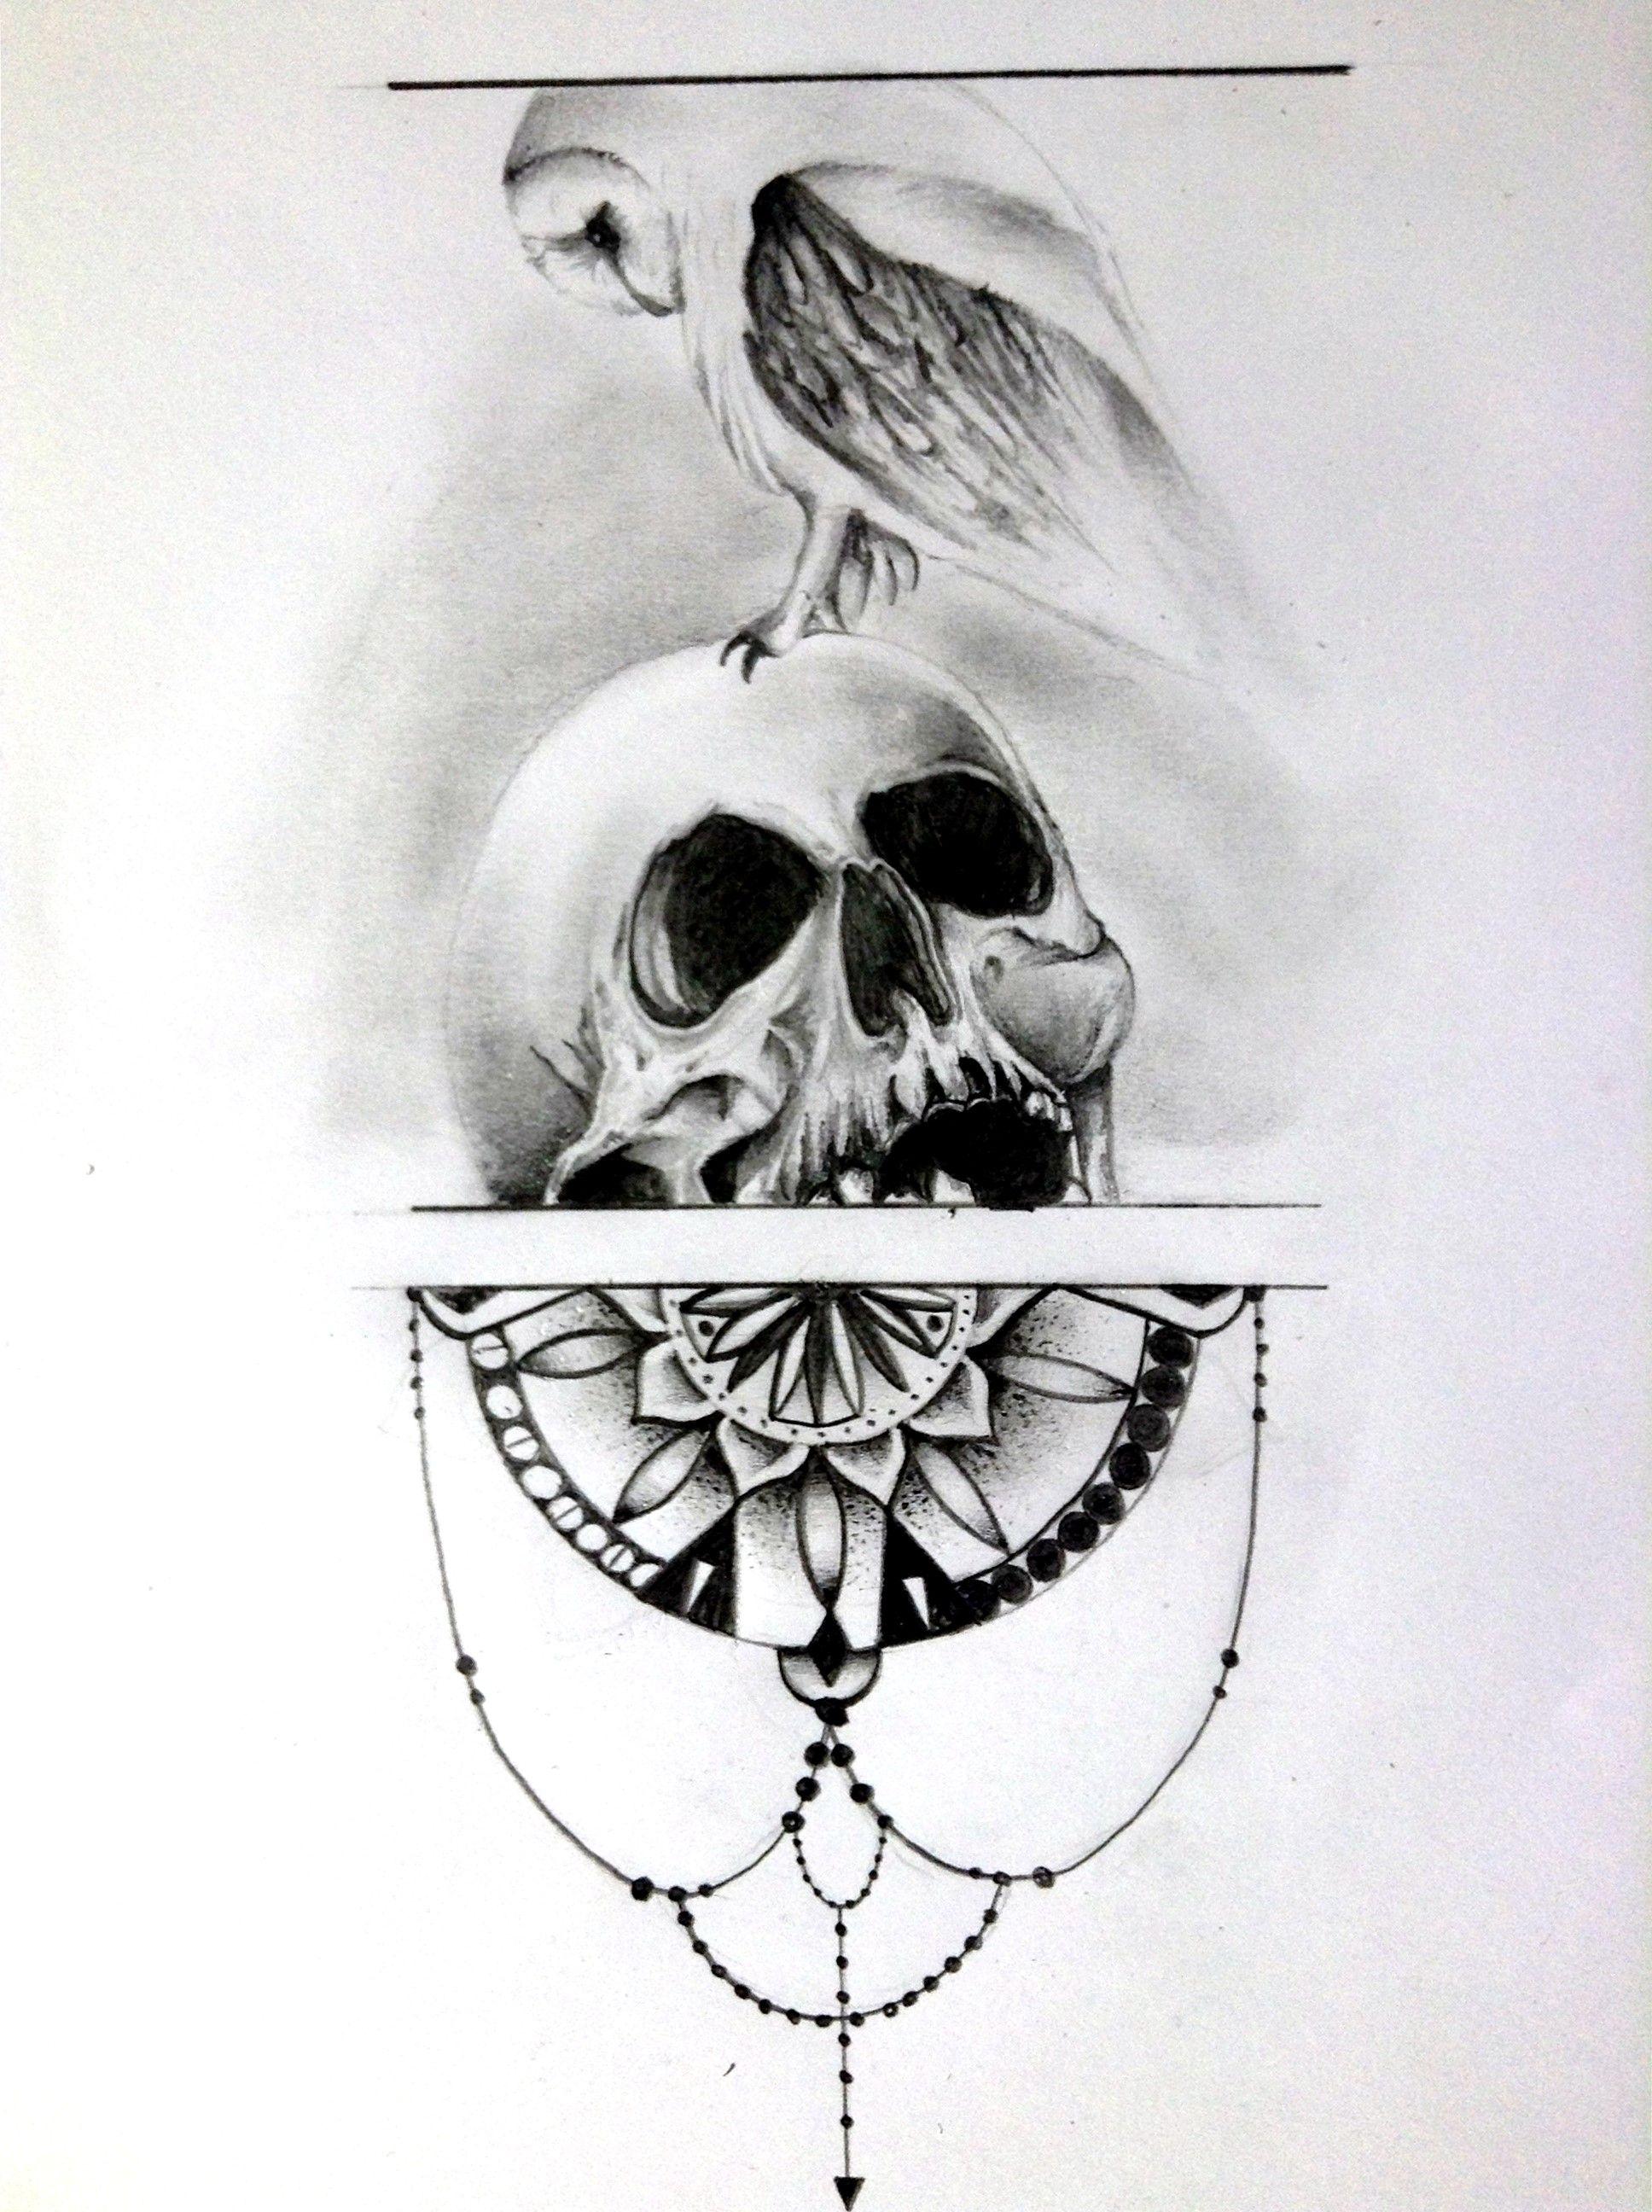 Owl Skull And Mandala Sketch | tattoo ideas | Tattoo ... - photo#13